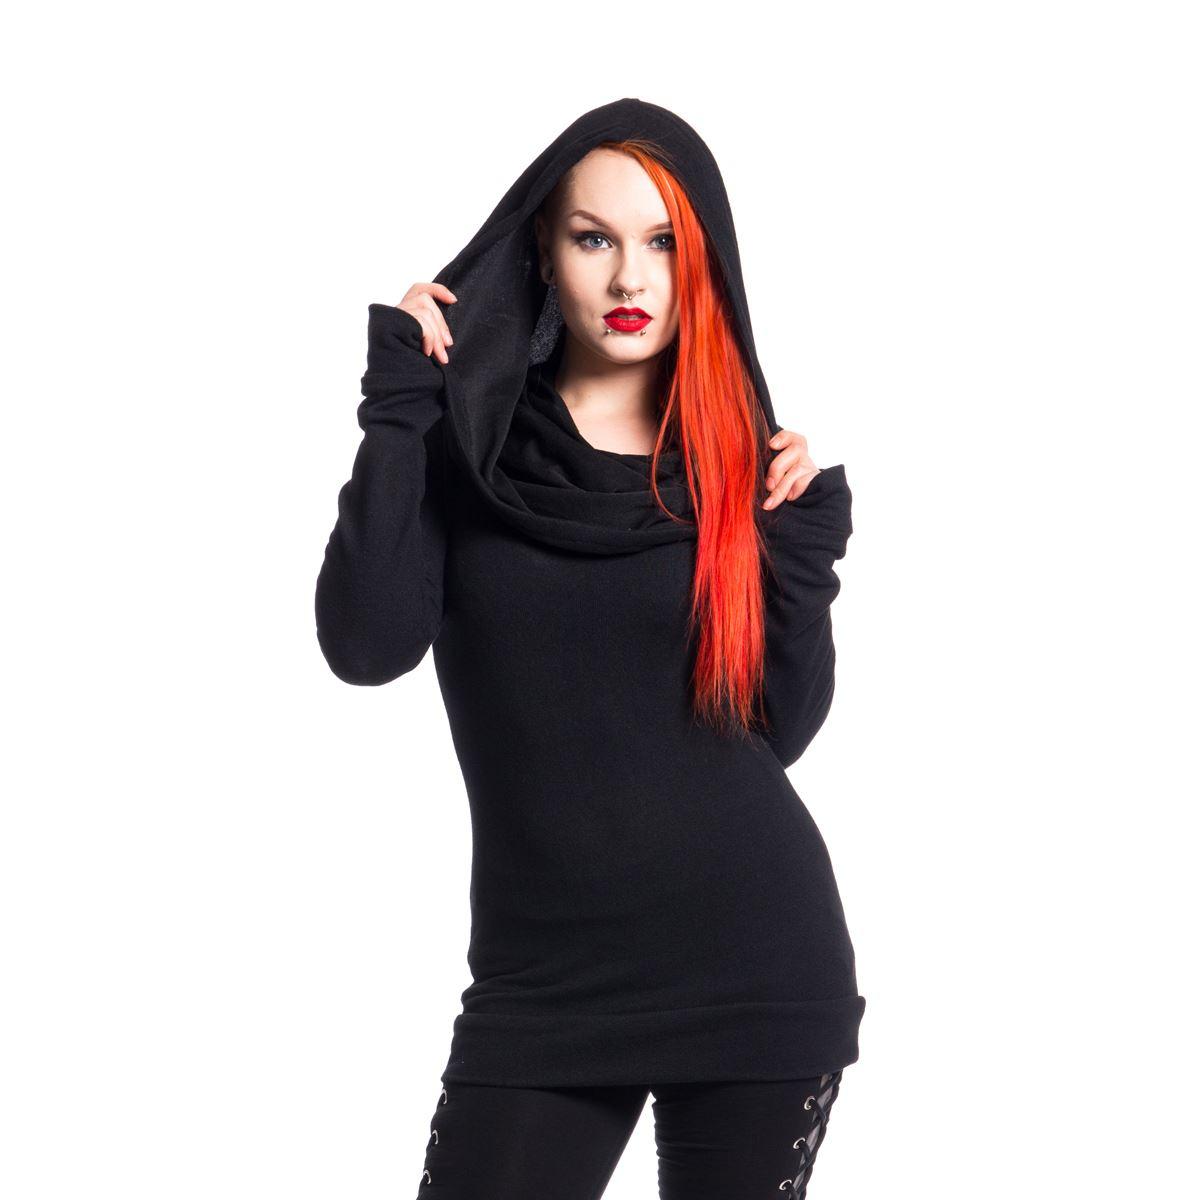 Vixxsin Rest Top Ladies Black Goth Emo Punk Girls Ebay